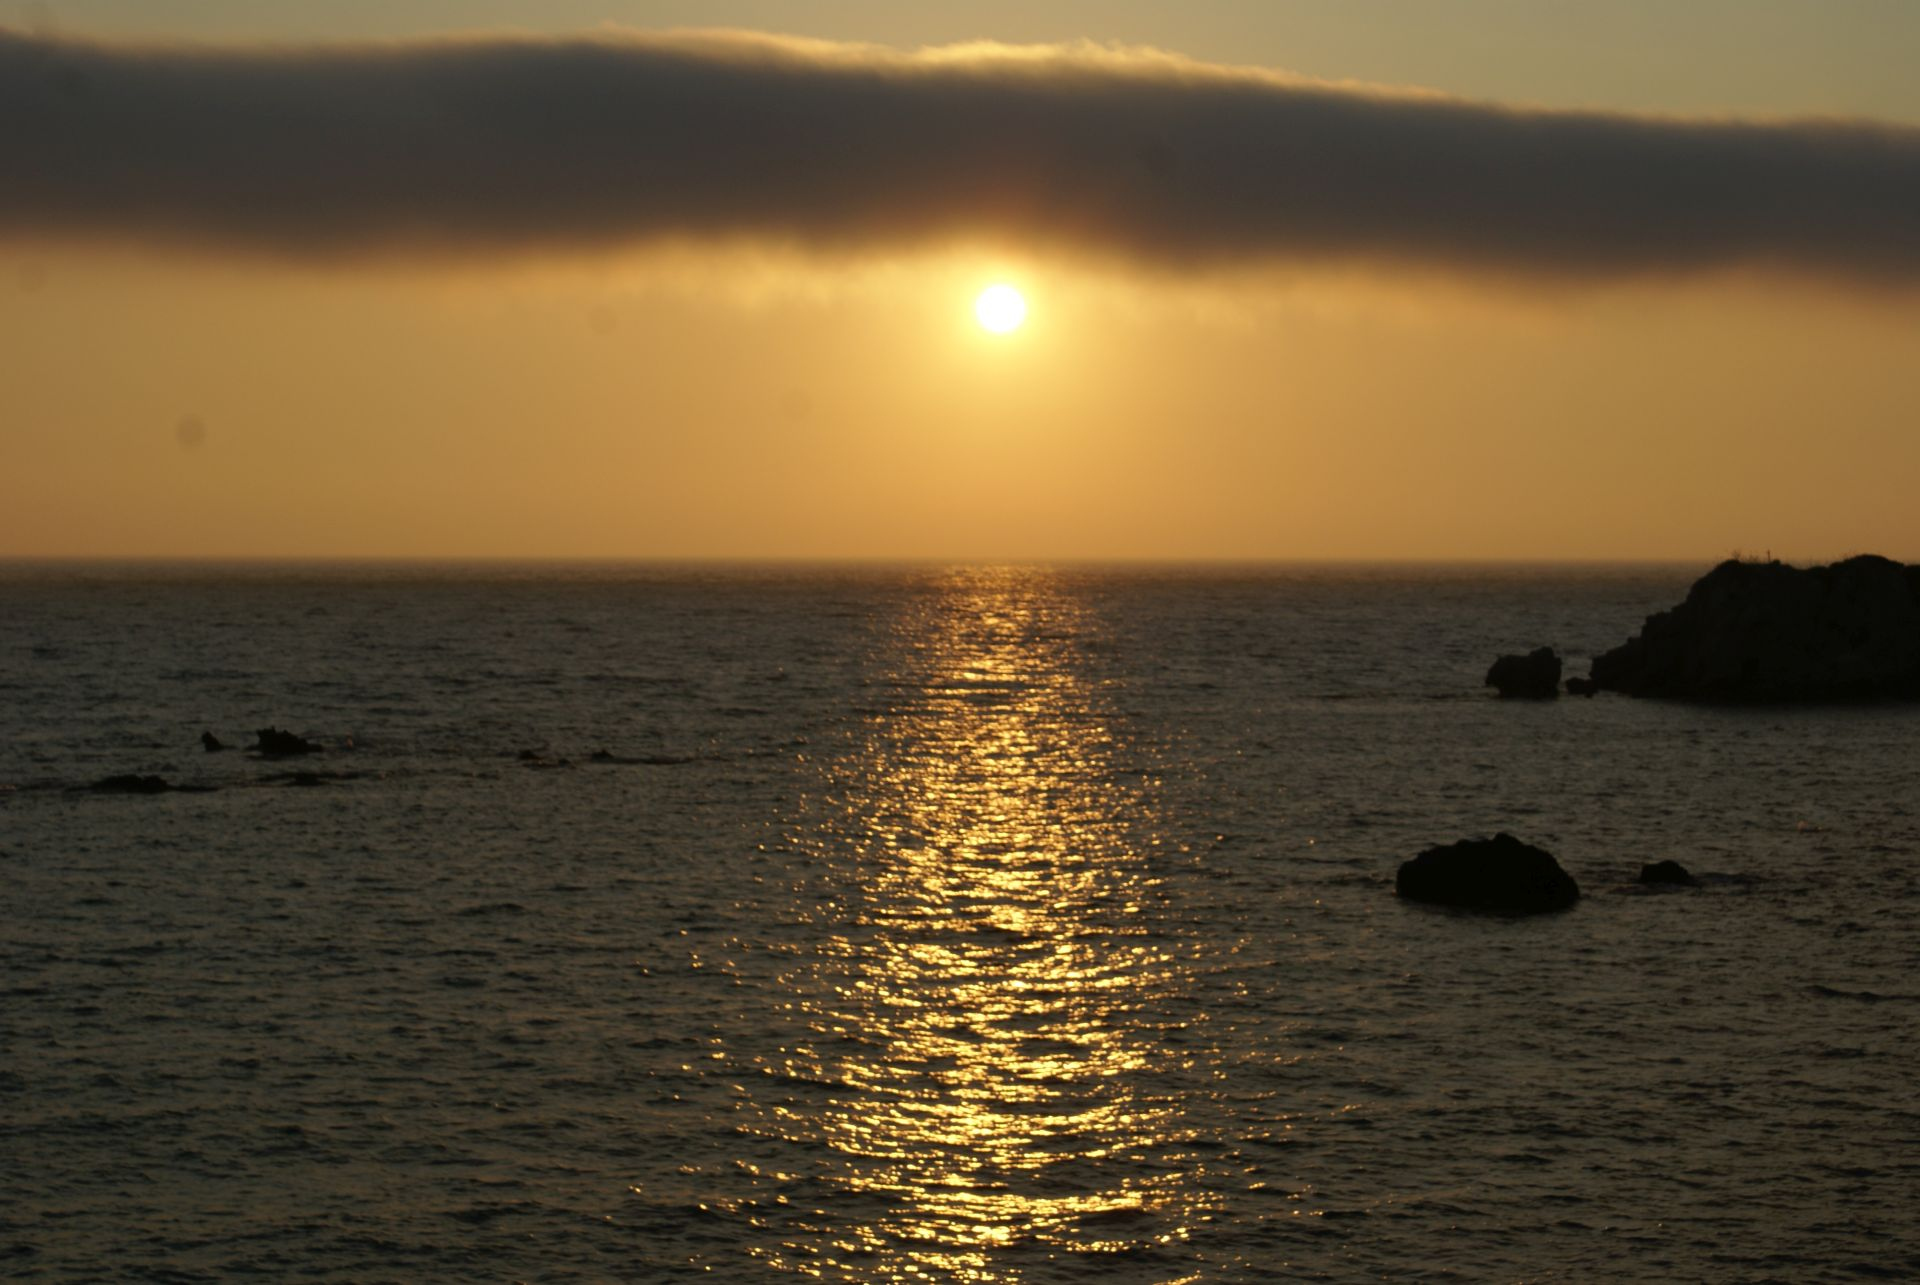 Abenddämmerung in der nahegelegene Taverne - Korfu Strandvilla Meliti, Kanouli, Agios Matheos, Korfu, KorfuCorfu